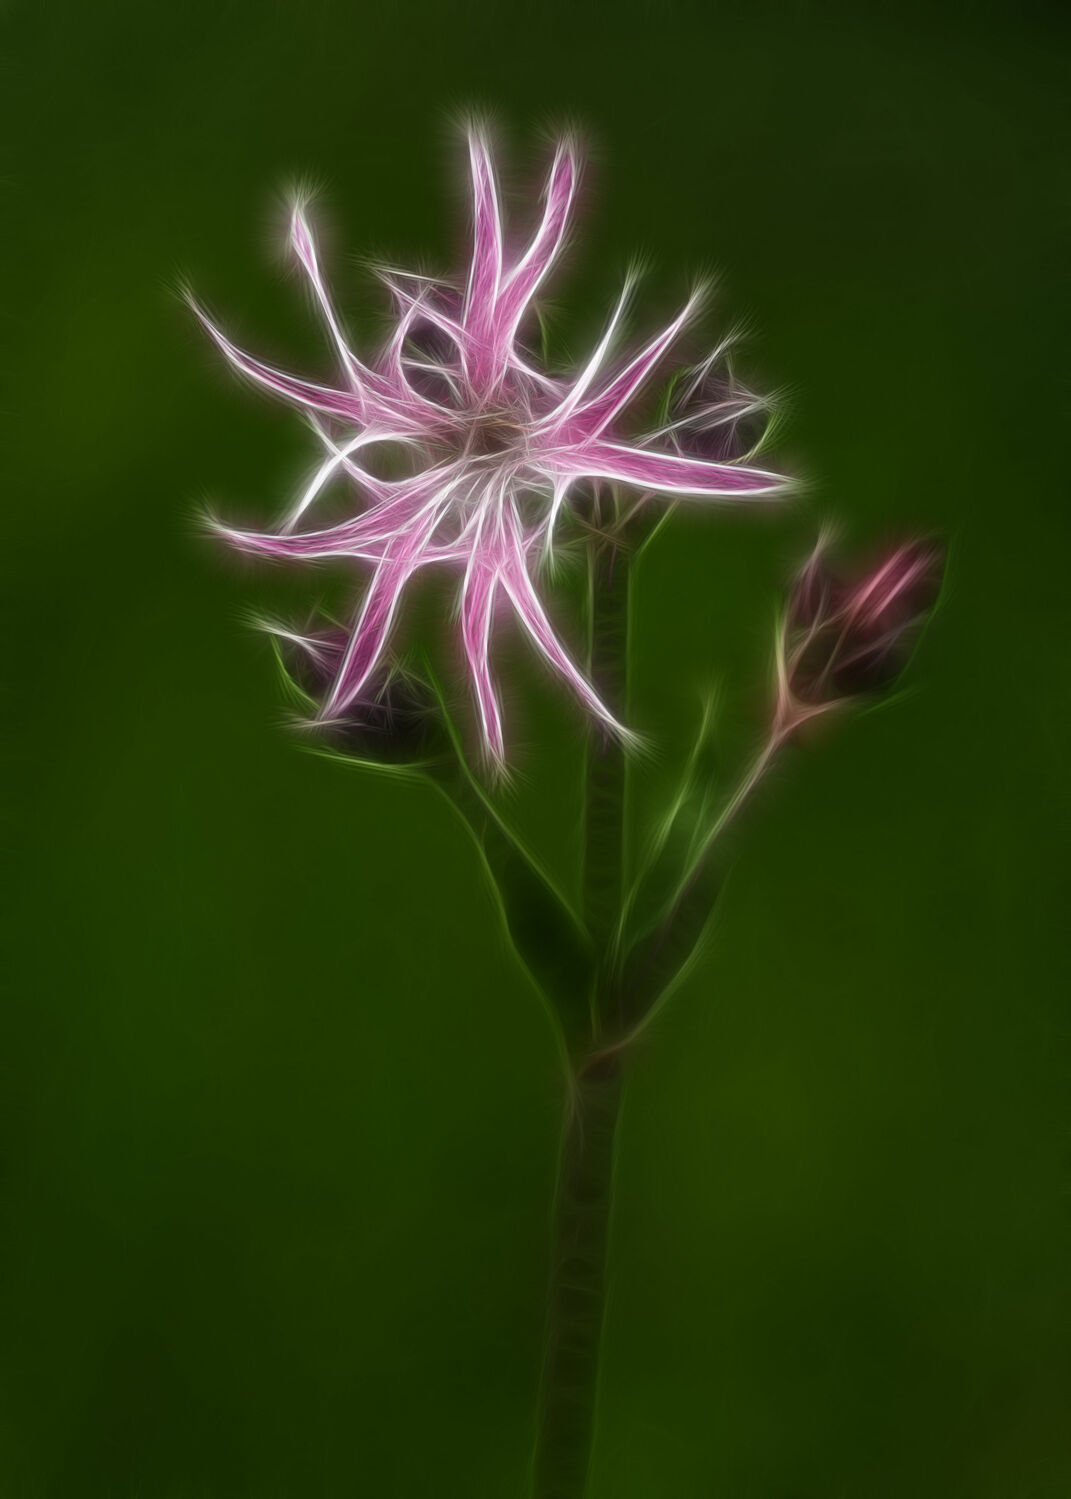 Bild mit Digital Art - Natur